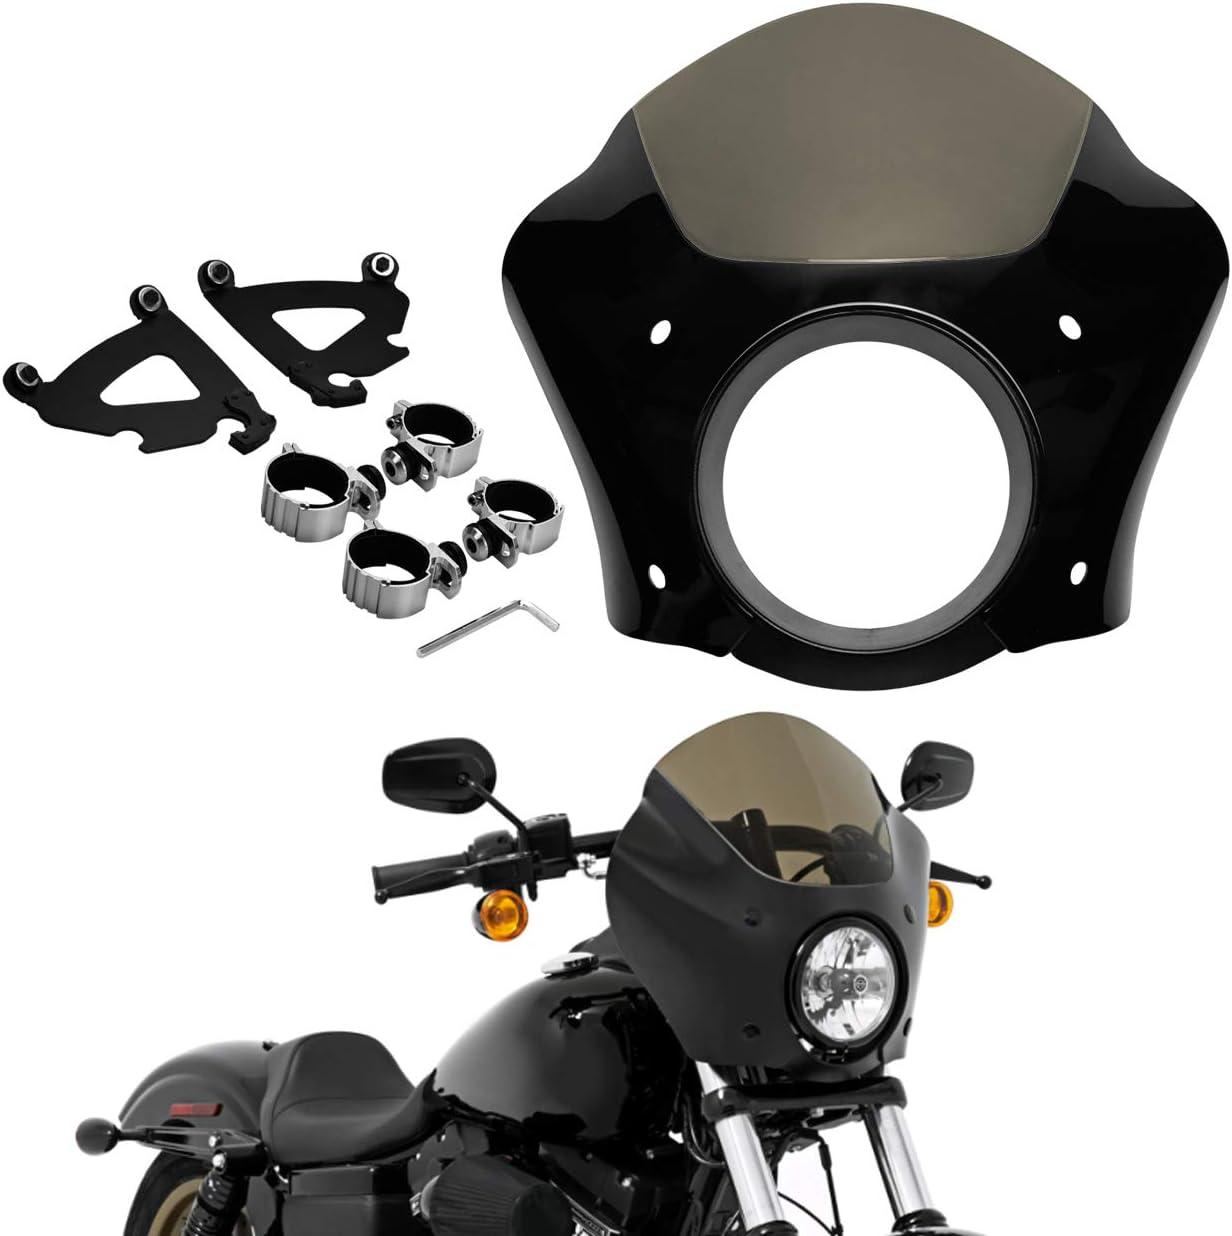 HDBUBALUS Black Headlight Gauntlet Fairing with 49 mm Trigger Lock Mount Fits for Harley Dyna Low Rider Street Bob 2006-2019